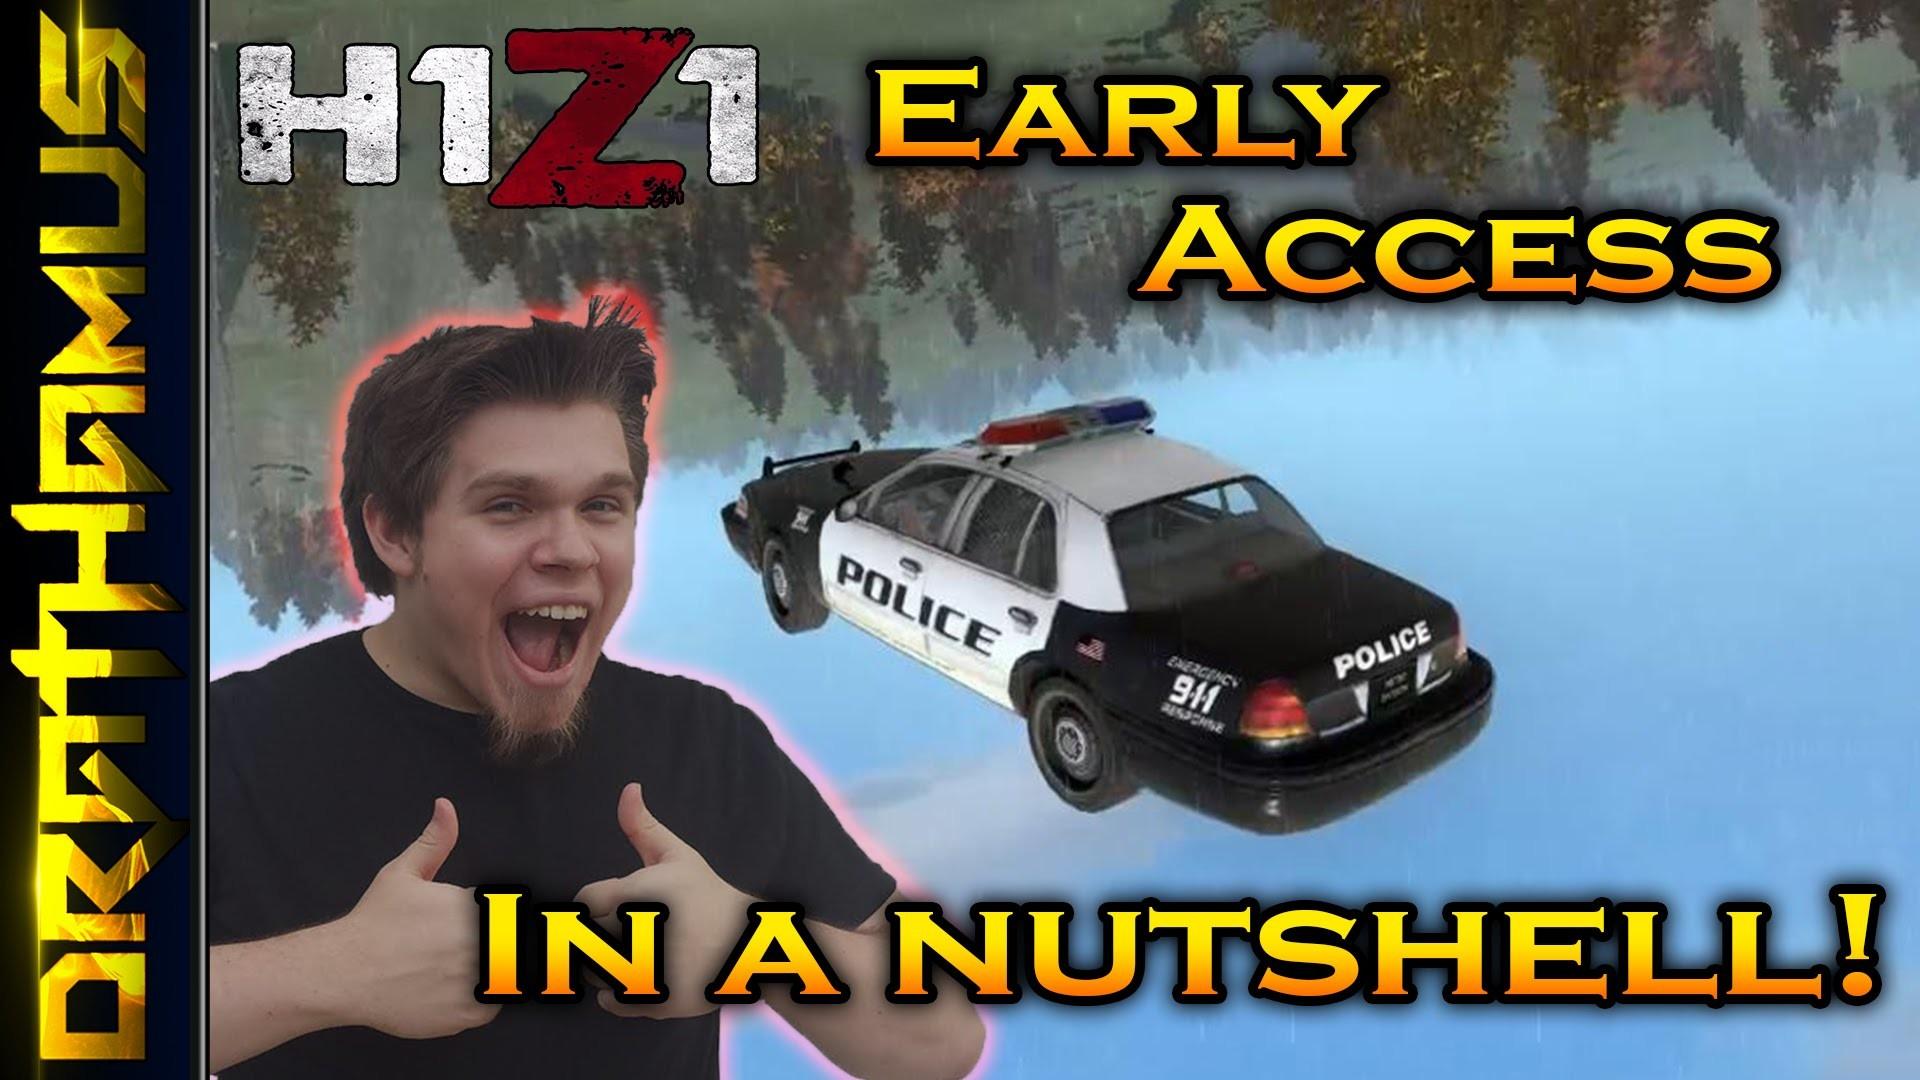 H1Z1 Early Access in a Nutshell! ▻ Dank Memes & Hilarious Bugs – YouTube